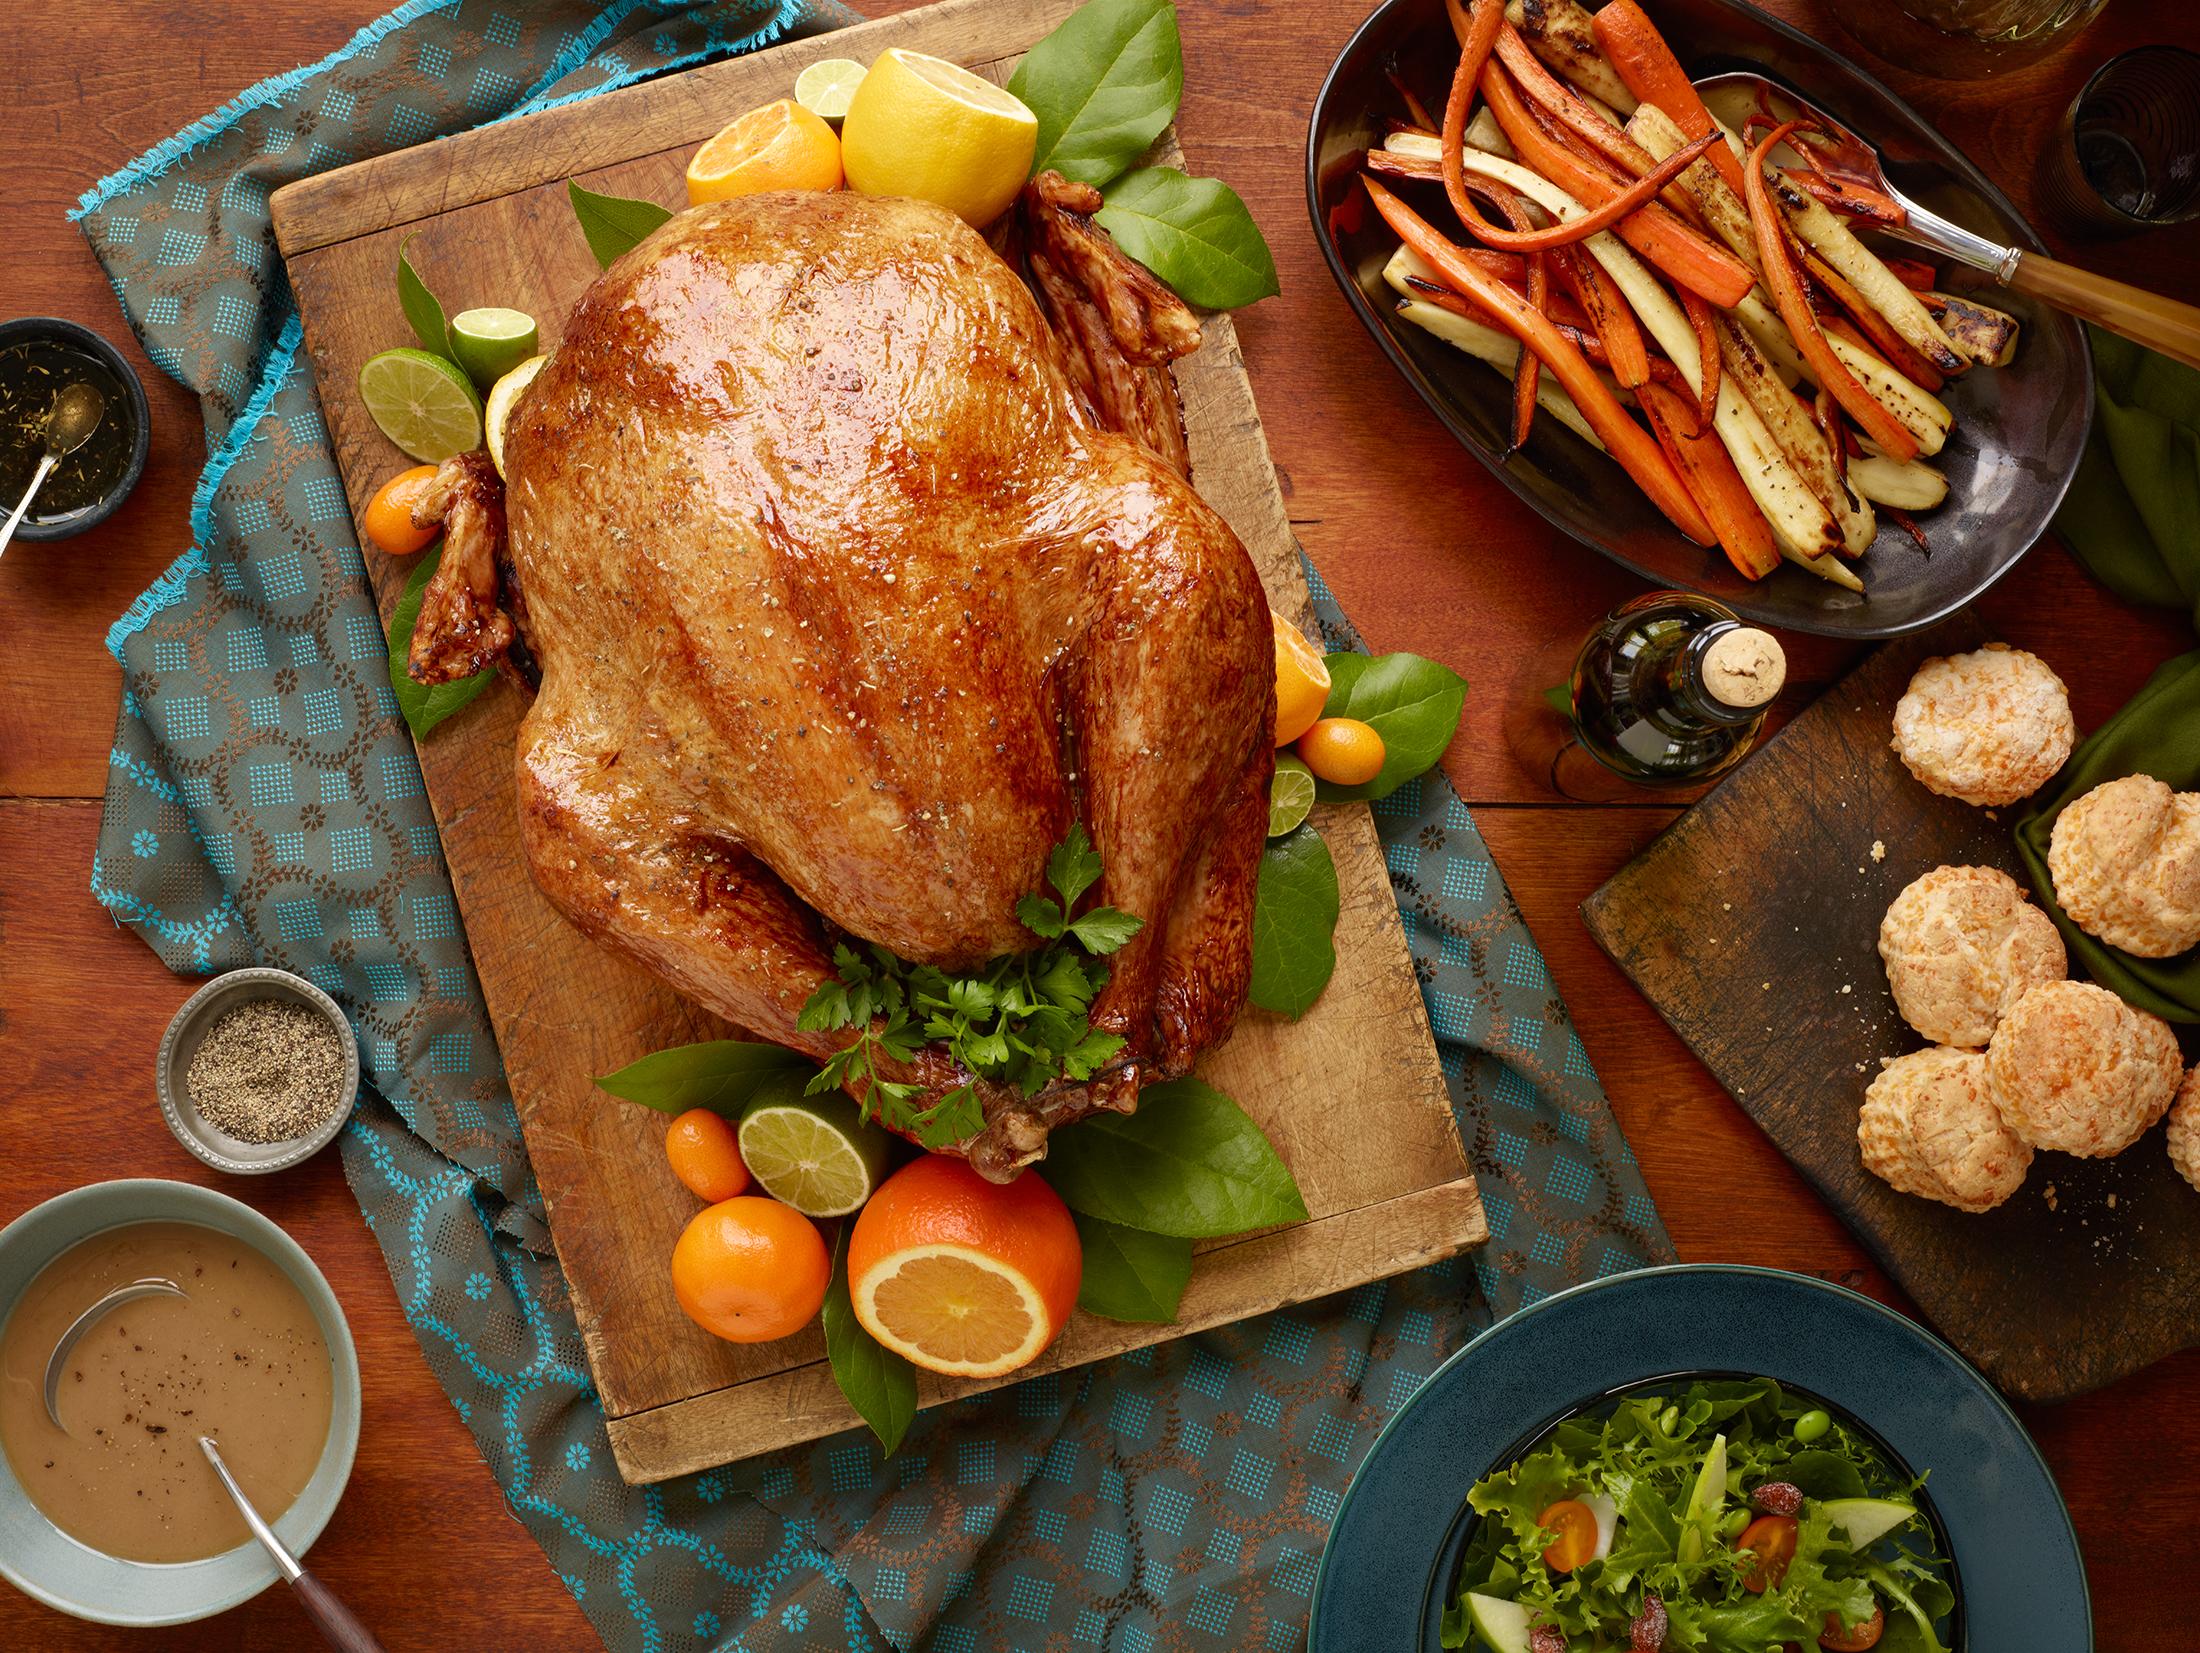 Turkey-over-head.jpg